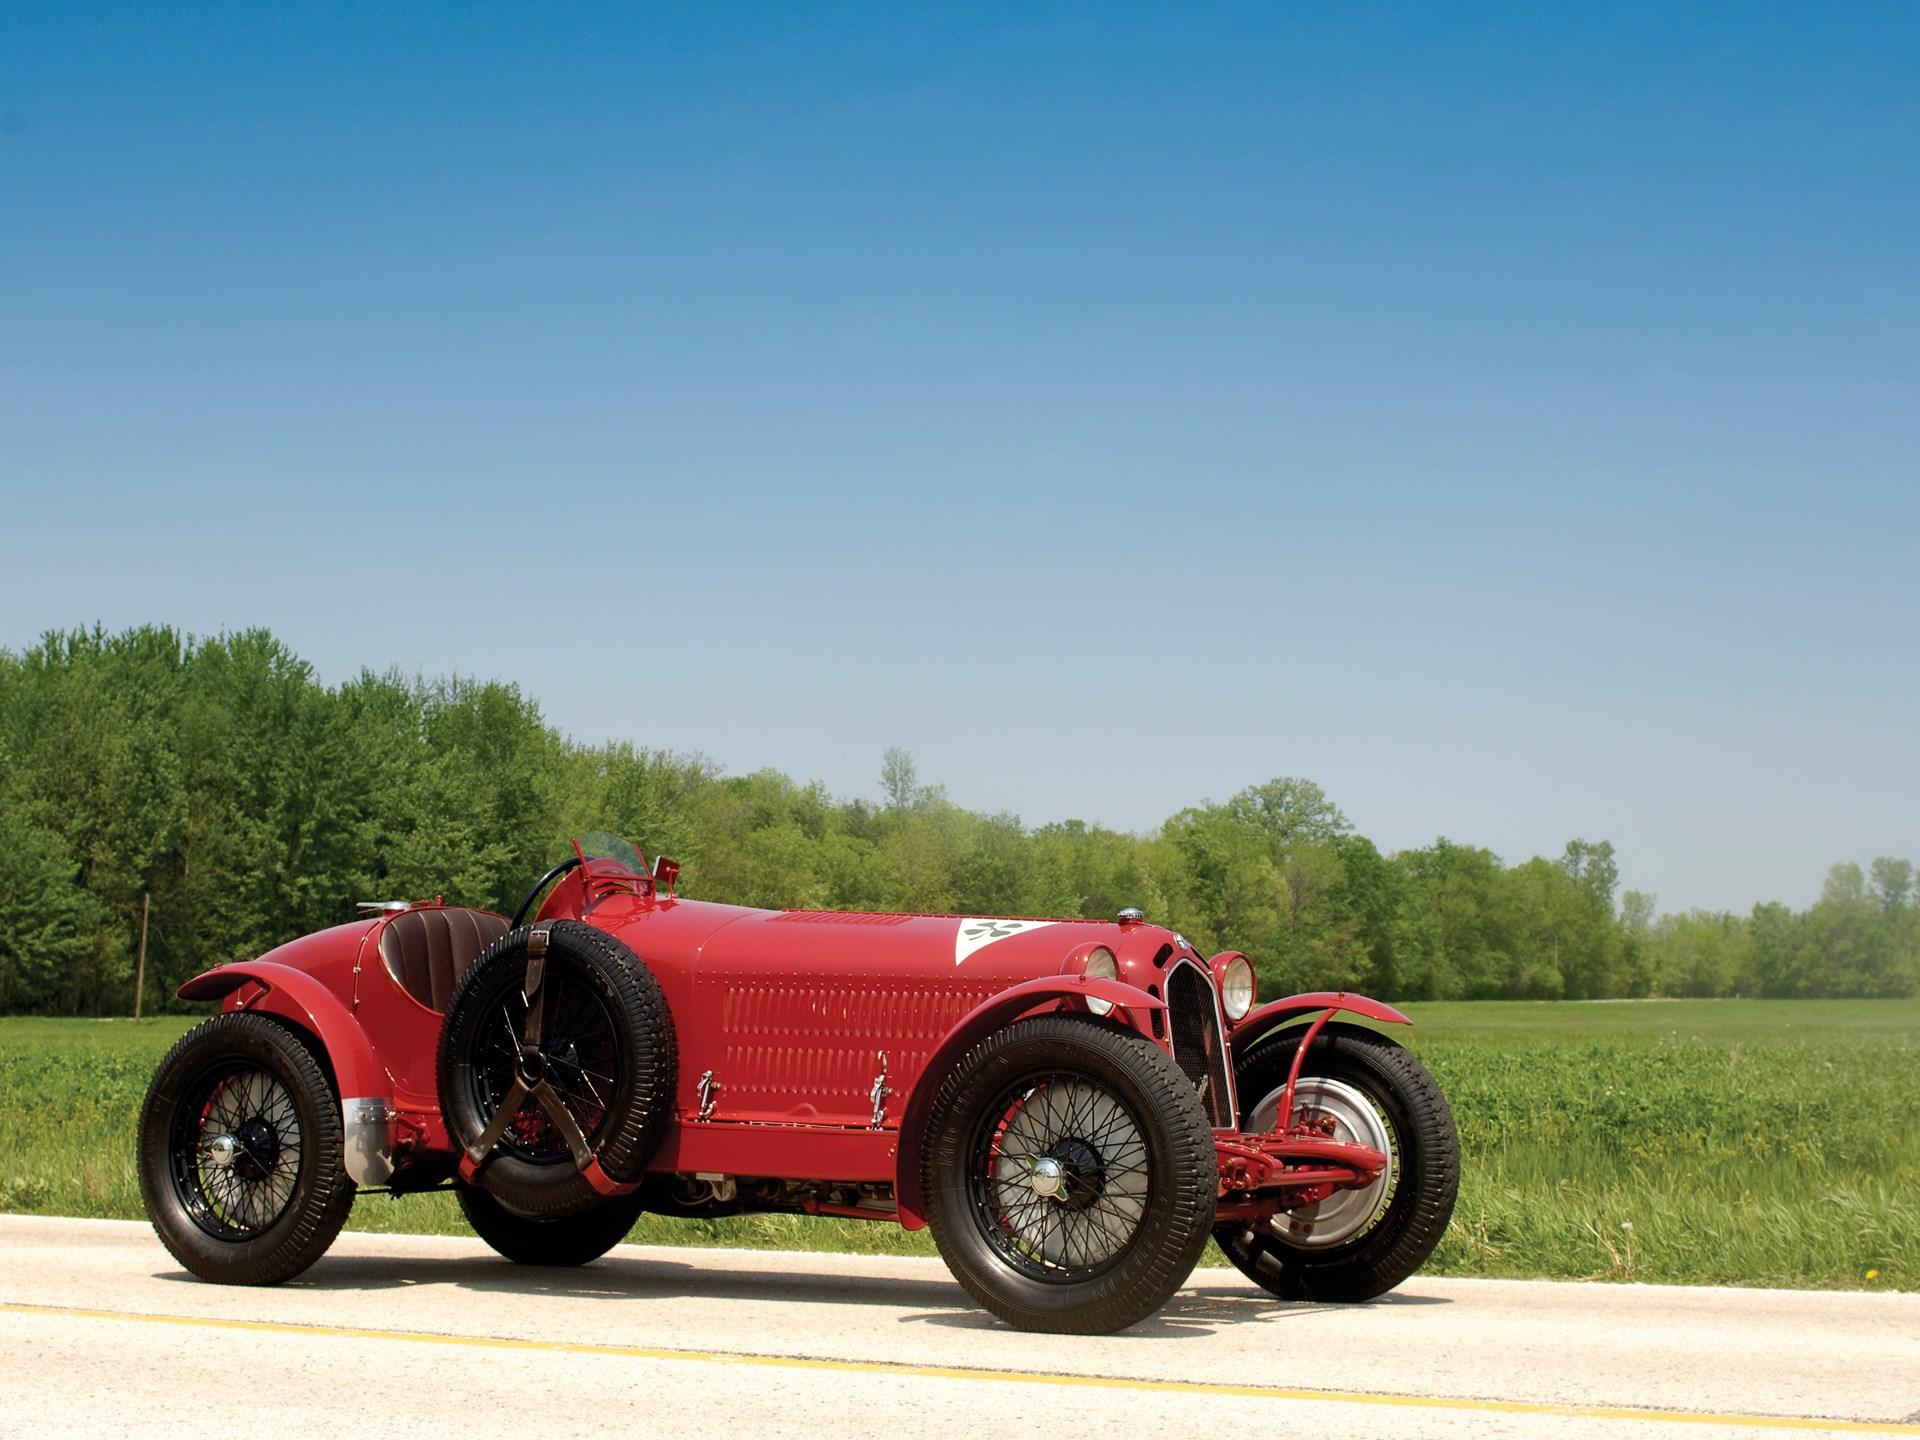 RM Sotheby's - 1933 Alfa Romeo 8C 2300 Monza Spider   Monterey ... on alfa romeo tz3 stradale zagato, alfa romeo 6c 1750 zagato, alfa romeo giulia zagato, alfa romeo 1600 junior zagato,